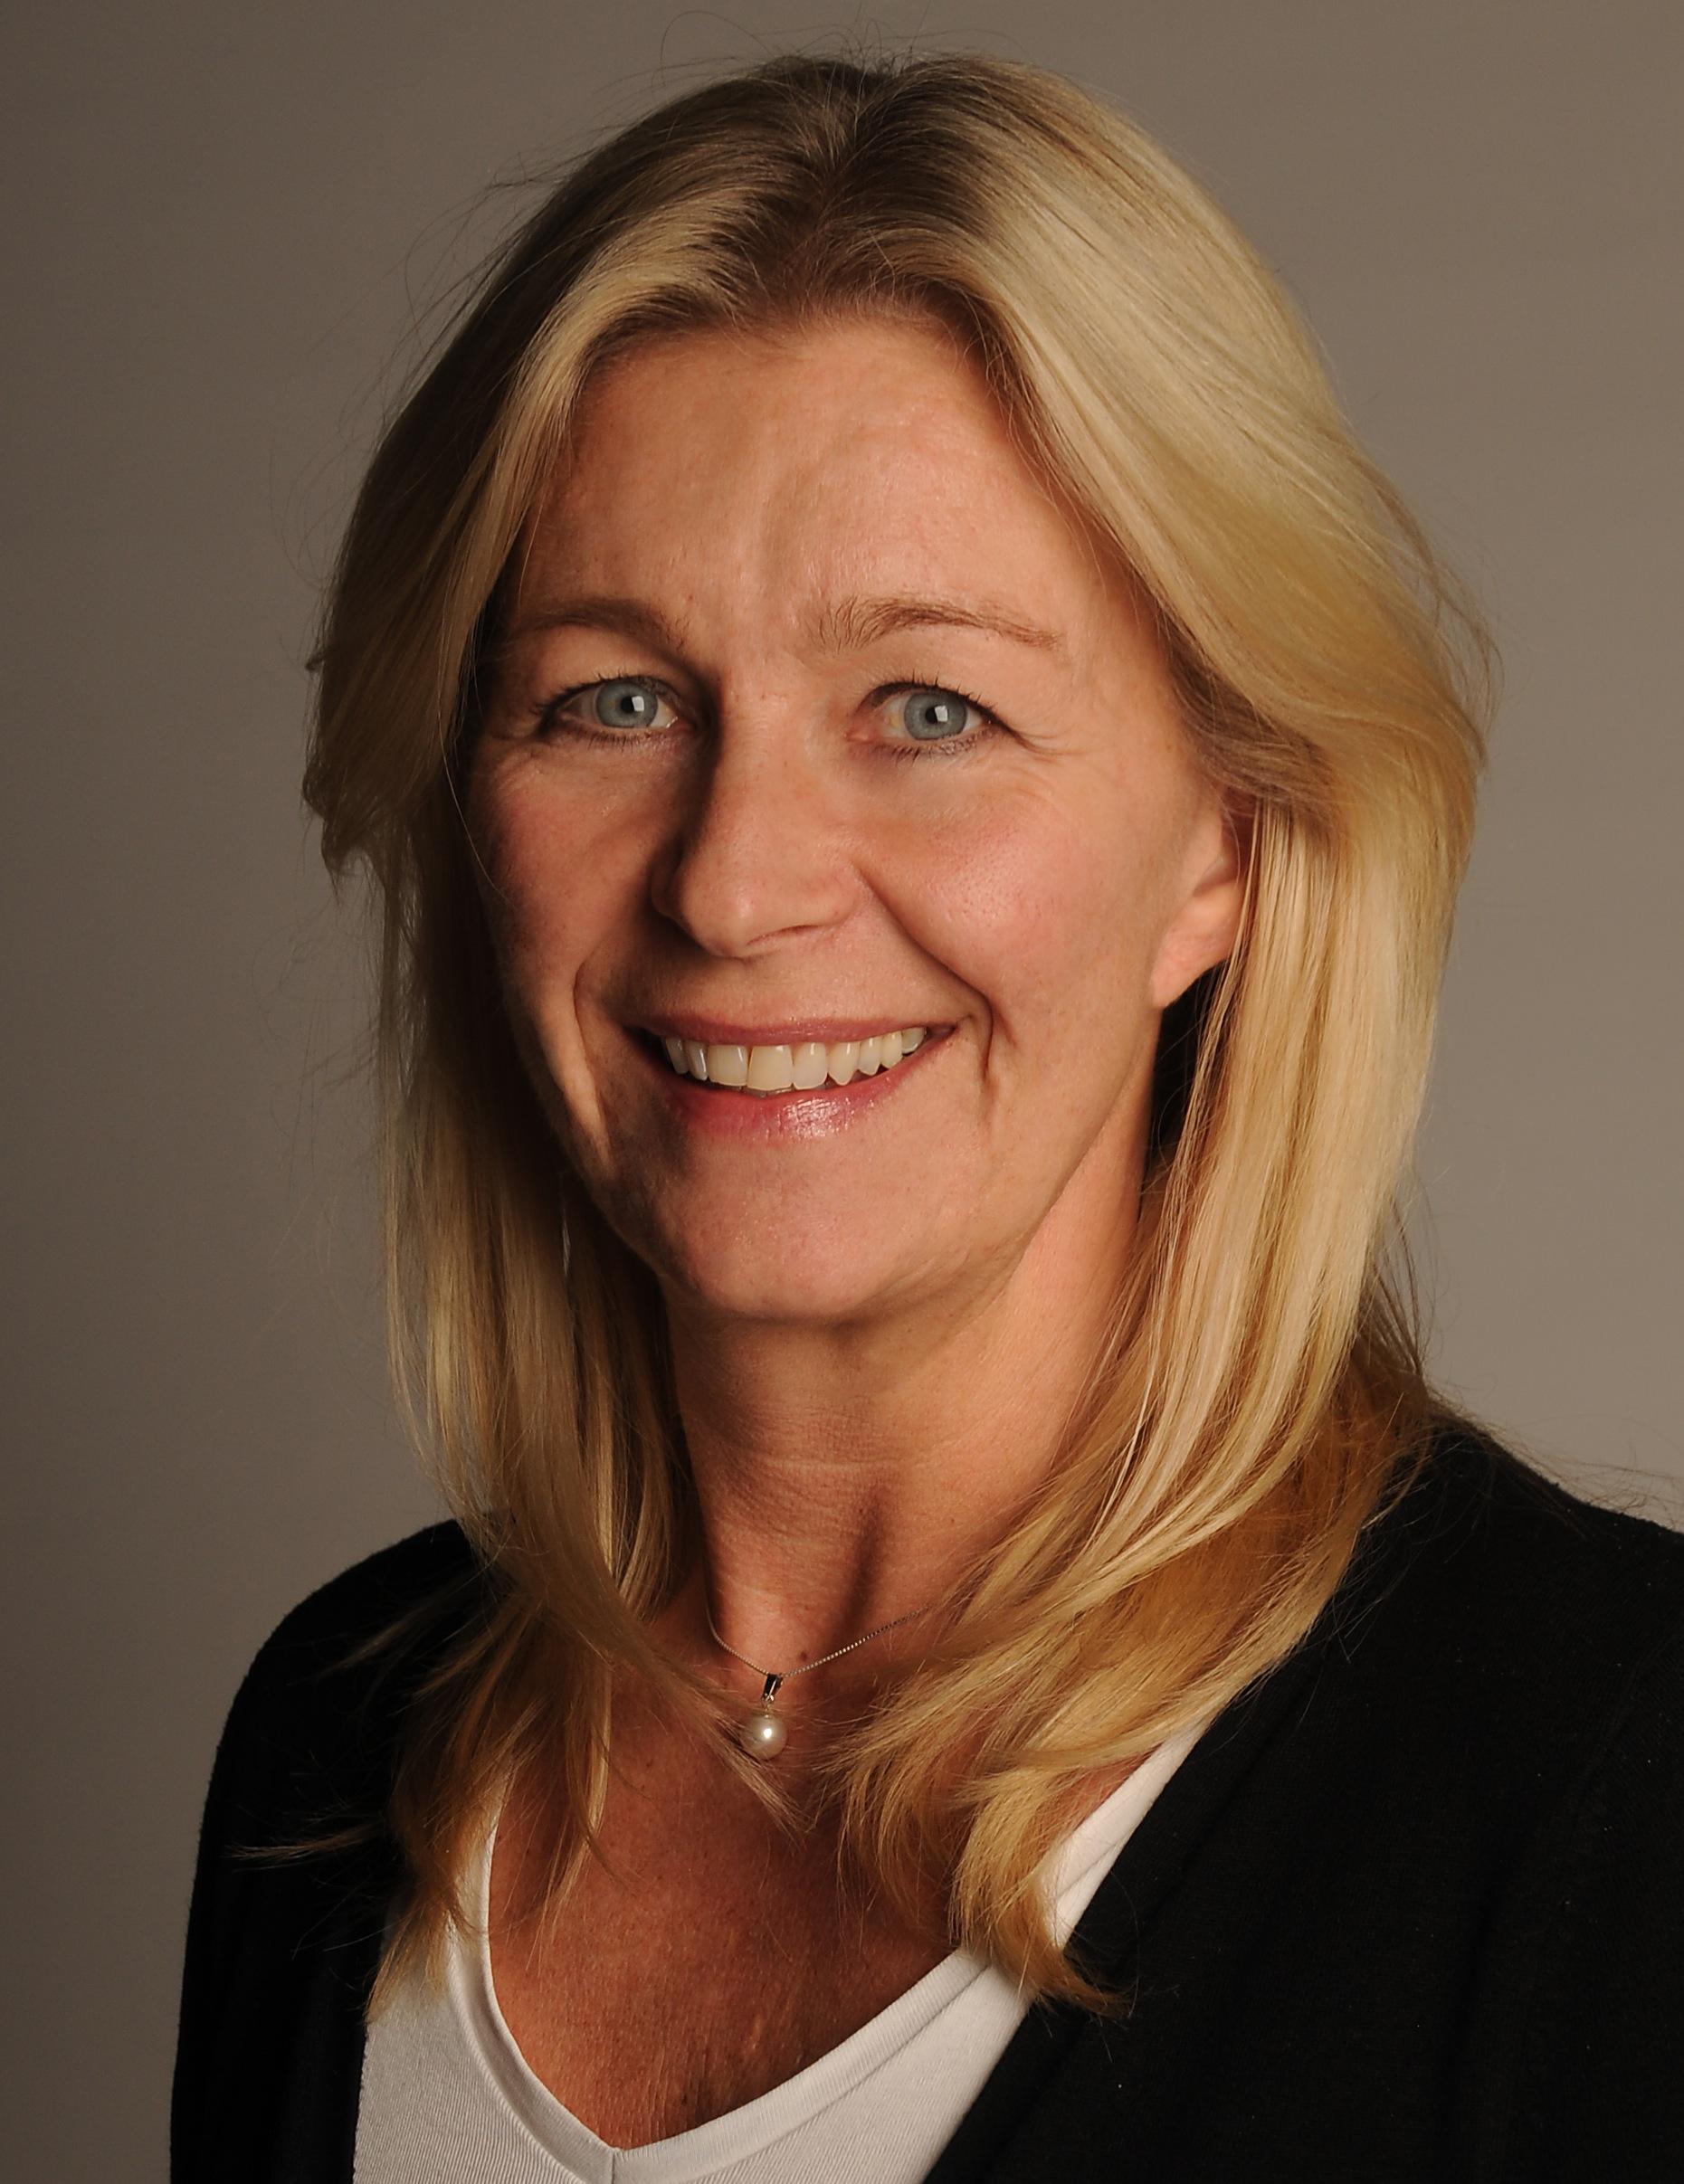 Marianne Gray